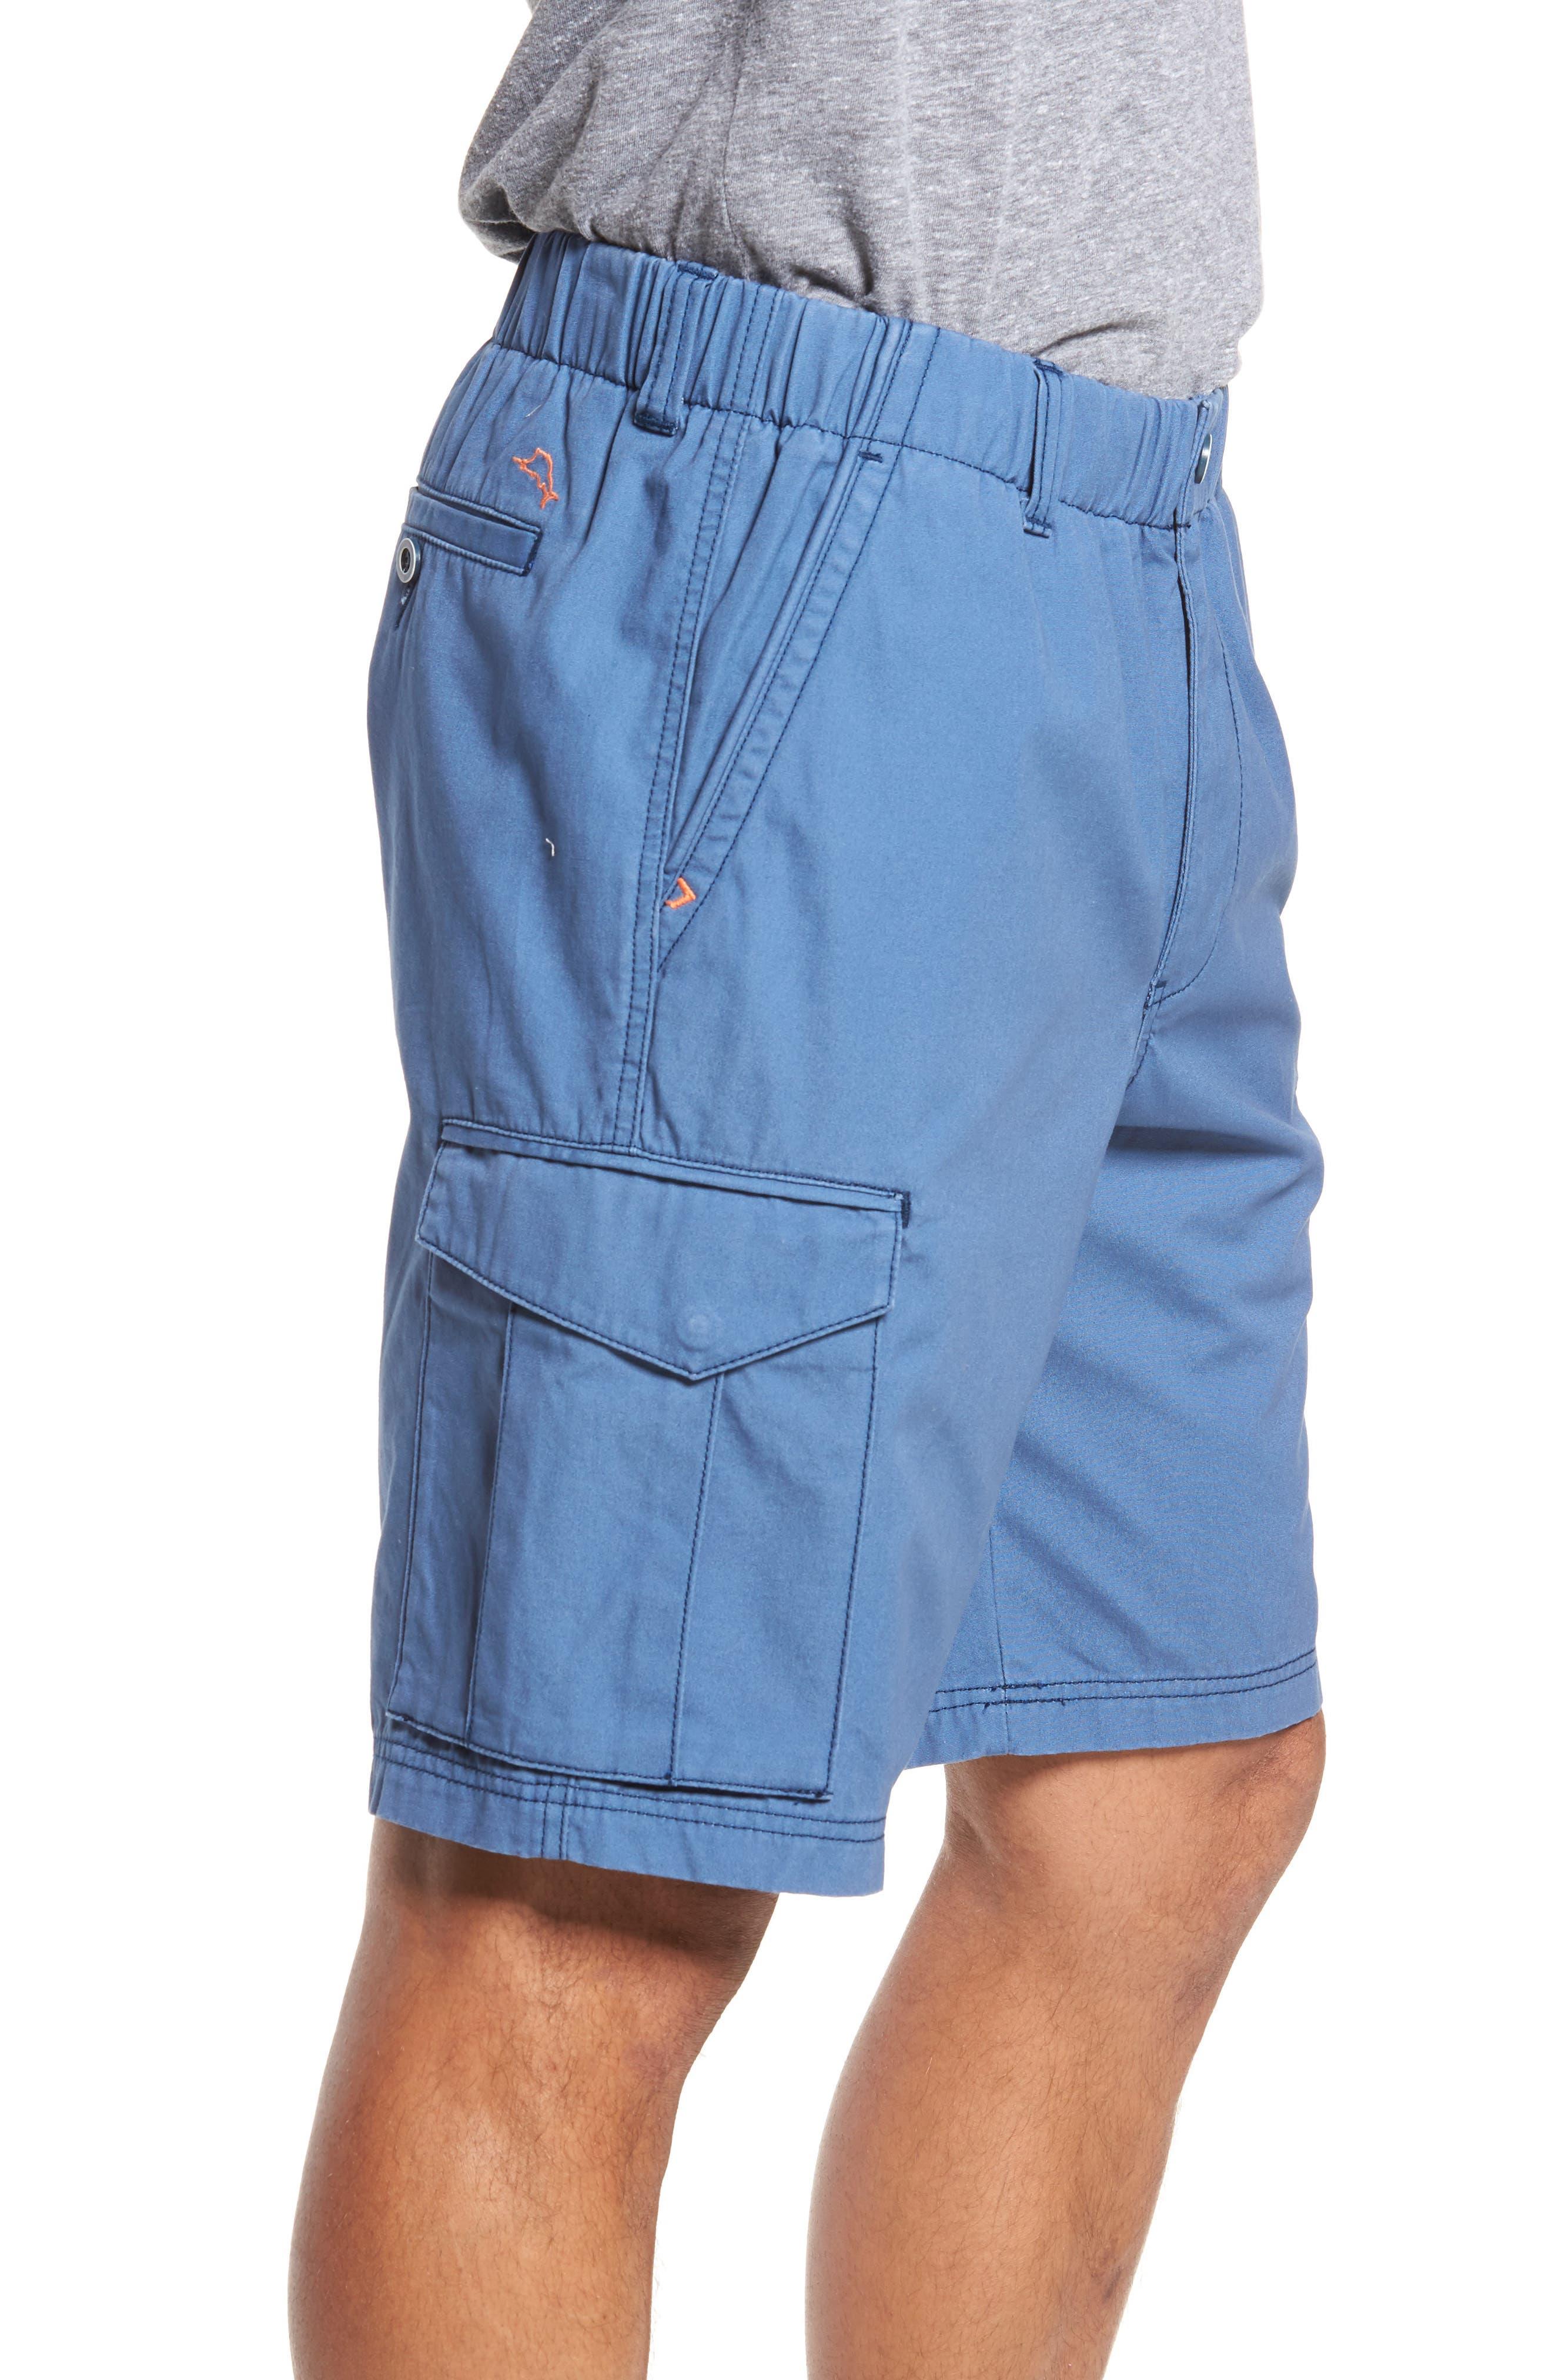 Island Survivalist Cargo Shorts,                             Alternate thumbnail 3, color,                             Dockside Blue